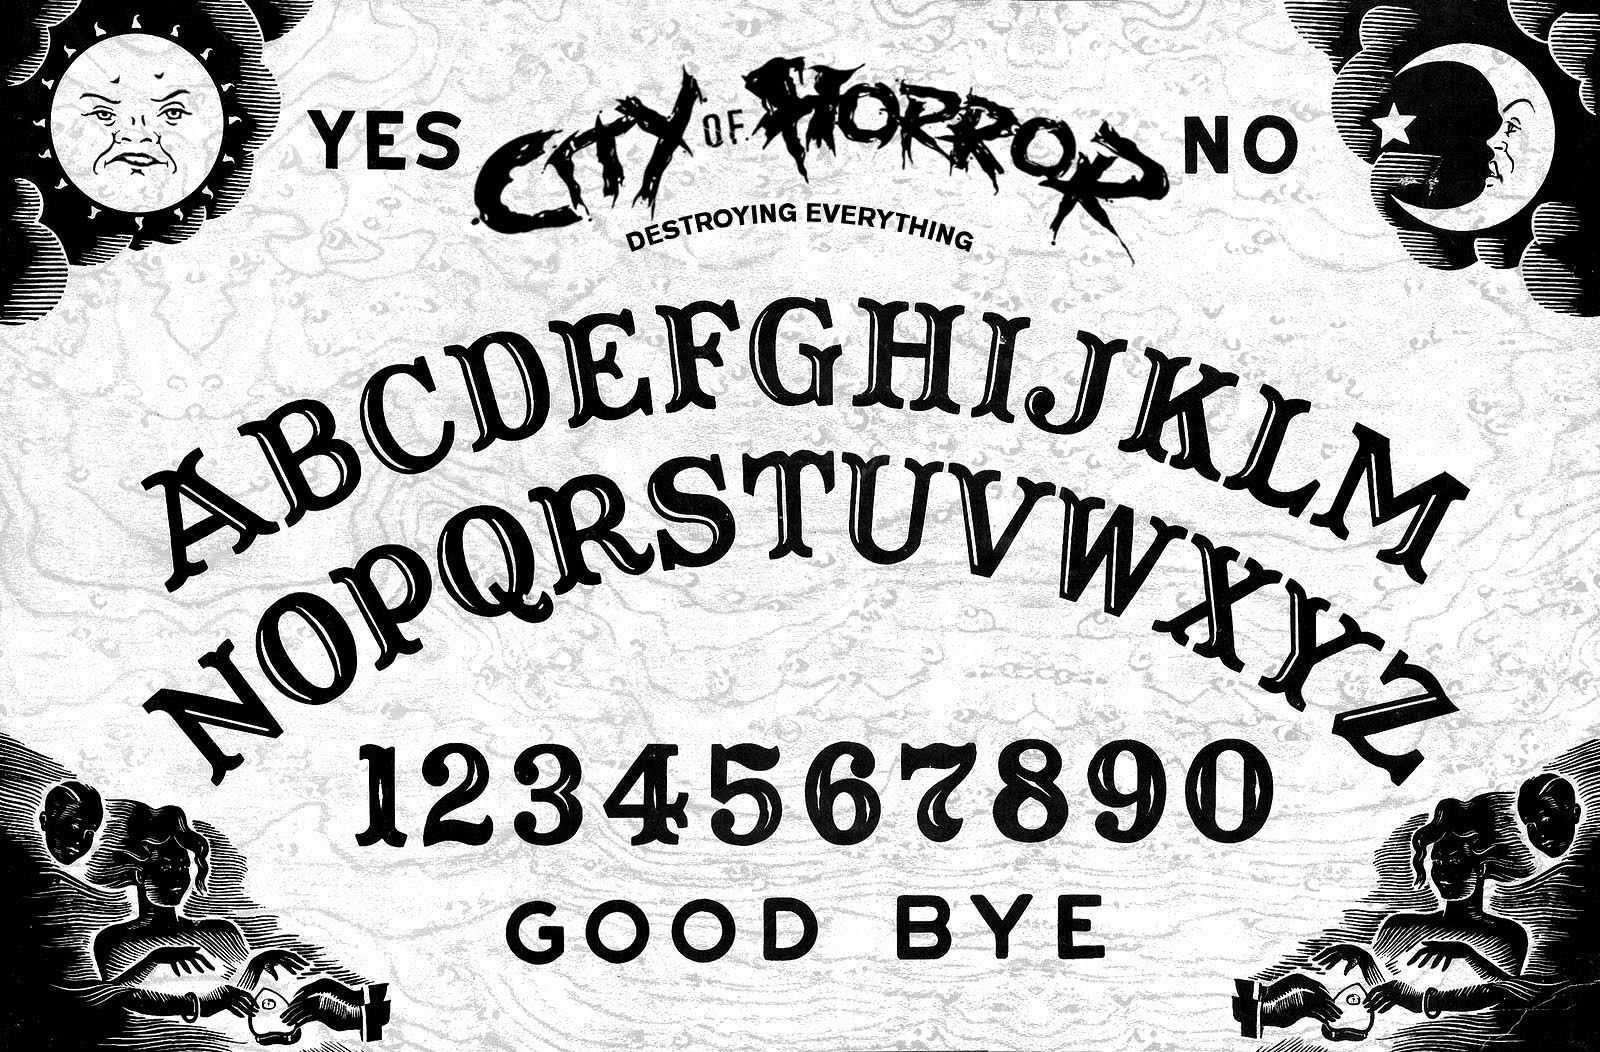 Cityofhorrorpatch1 28b 26w 29 Jpg 1 600 1 052 Pixeles Ouija Ouija Board Trippy Gif